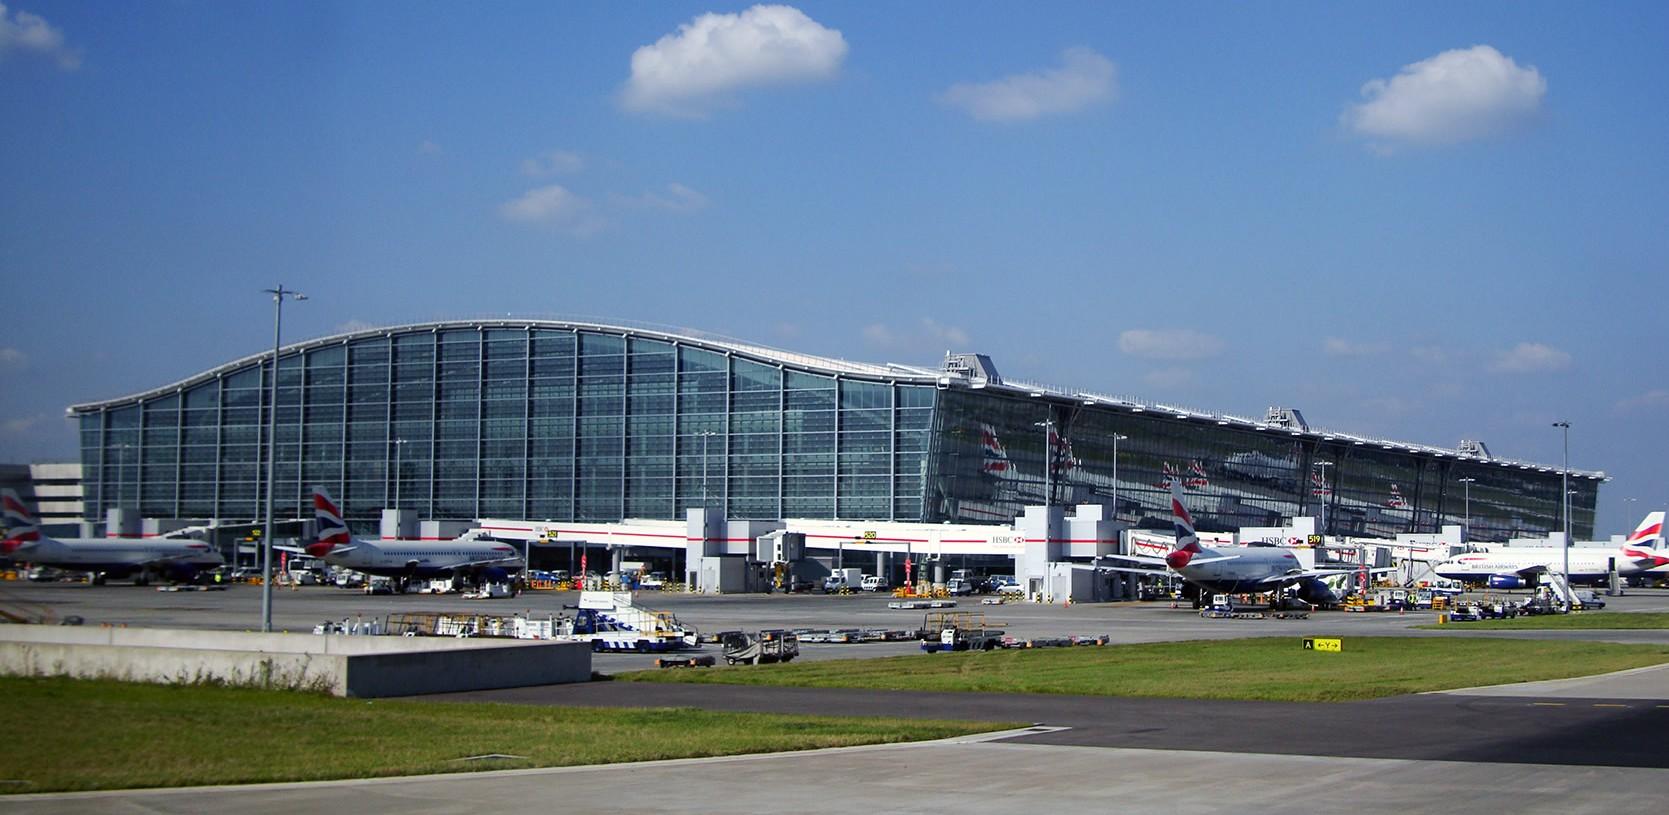 Heathrow aeroporto by wikipedia